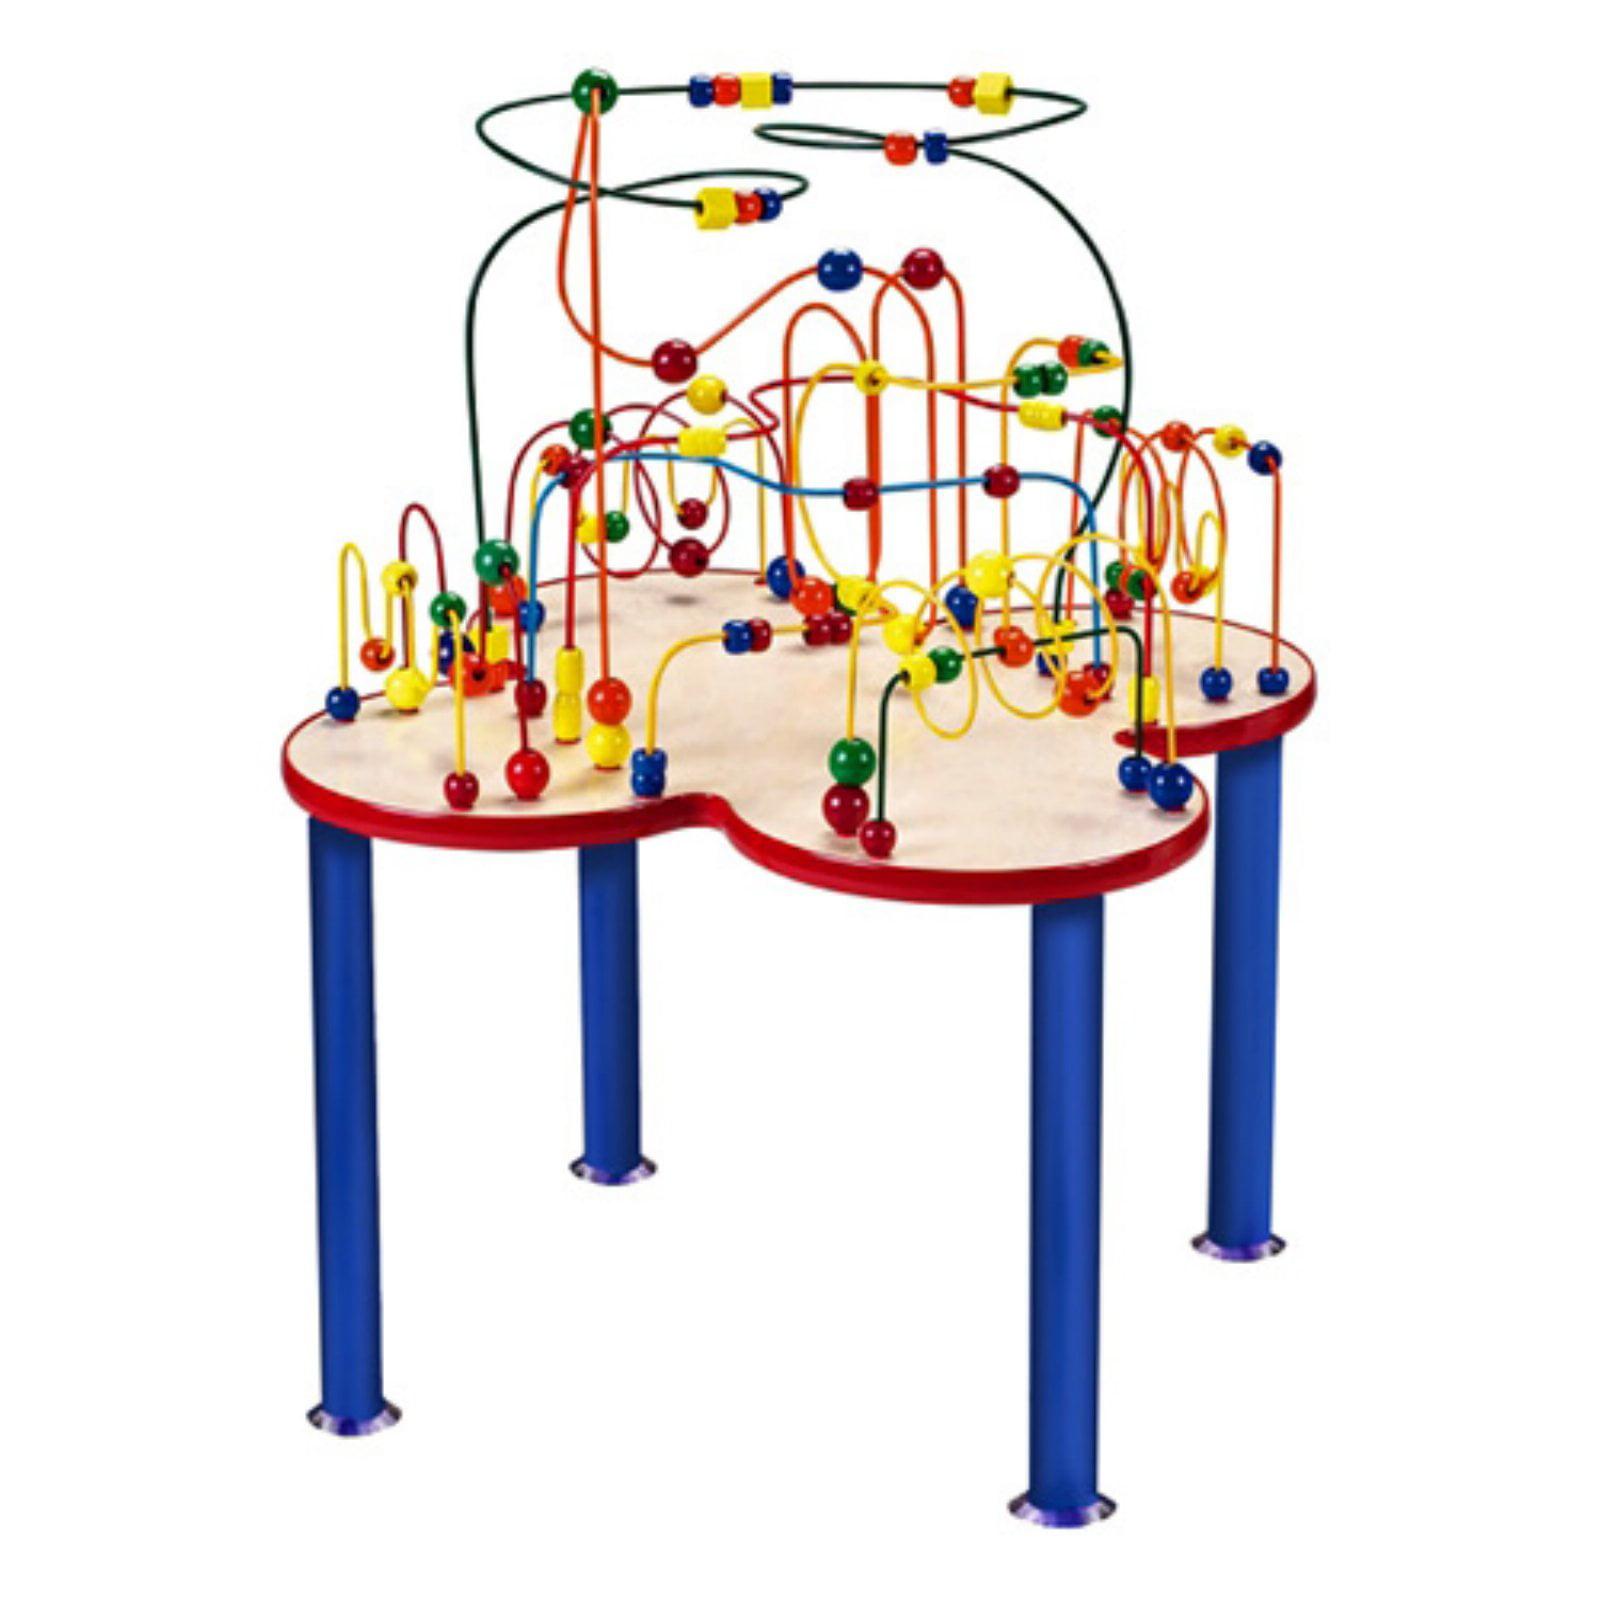 Anatex Fleur Rollercoaster Bead Table with Metal Legs